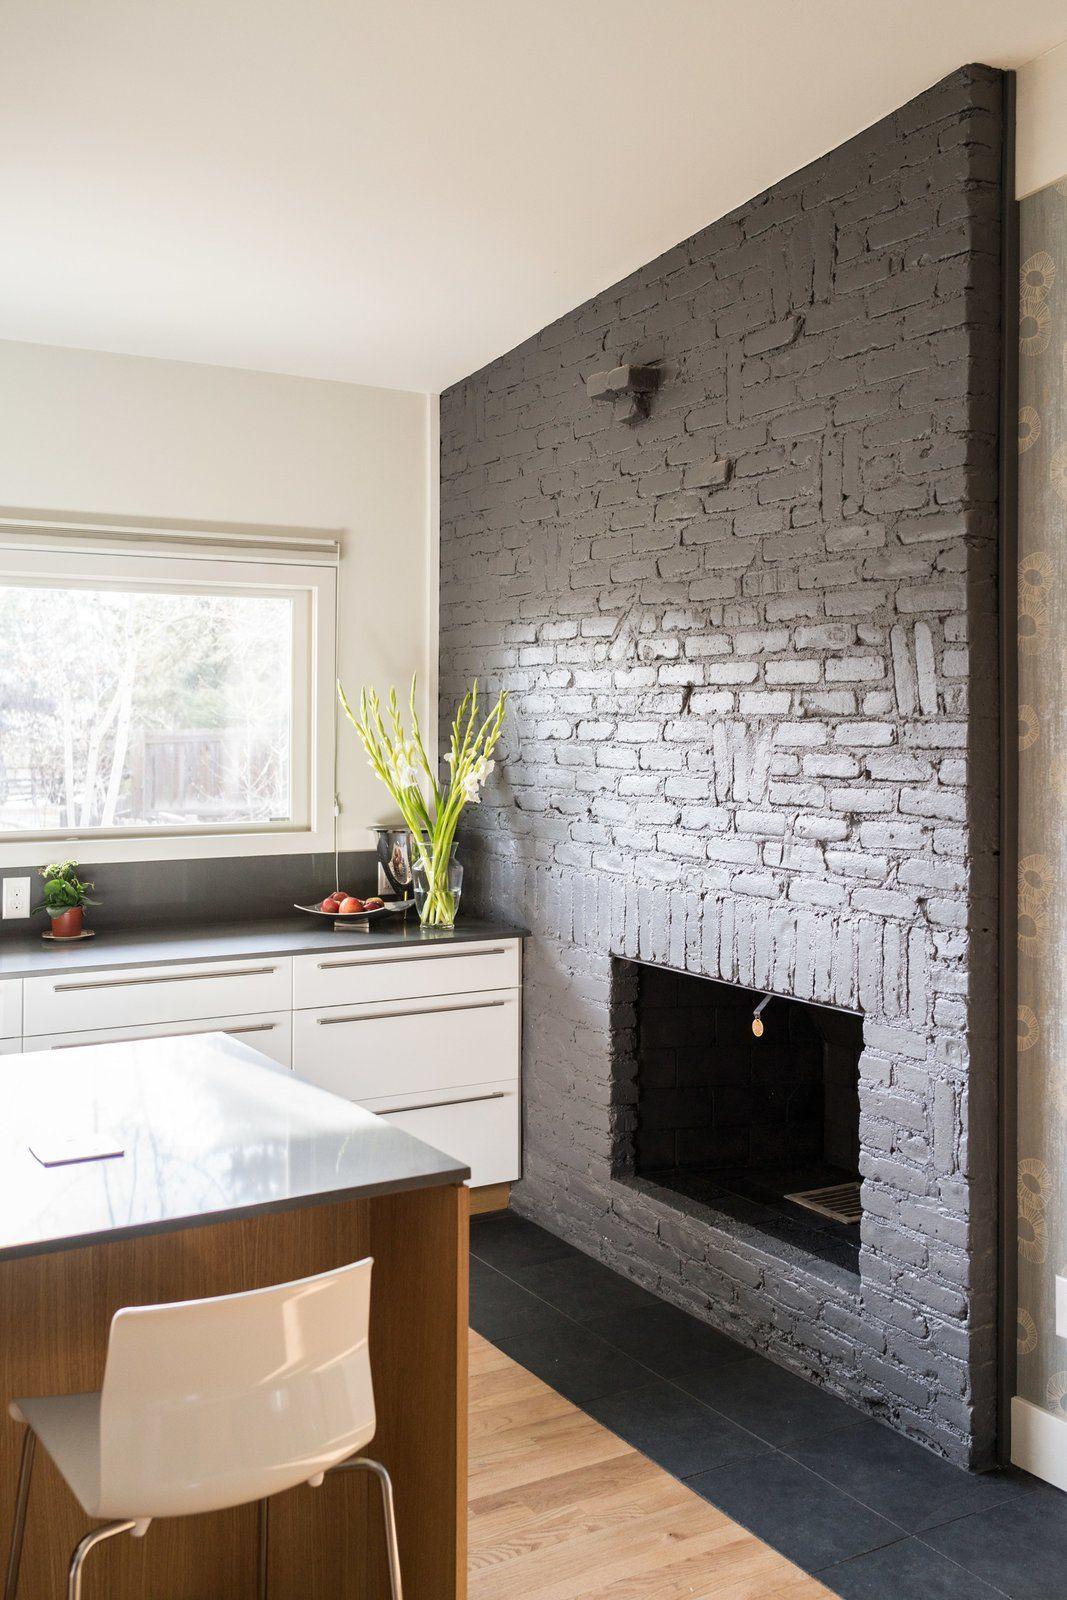 Kitchen Fireplace Original Brick Was Damaged So It Was Painted